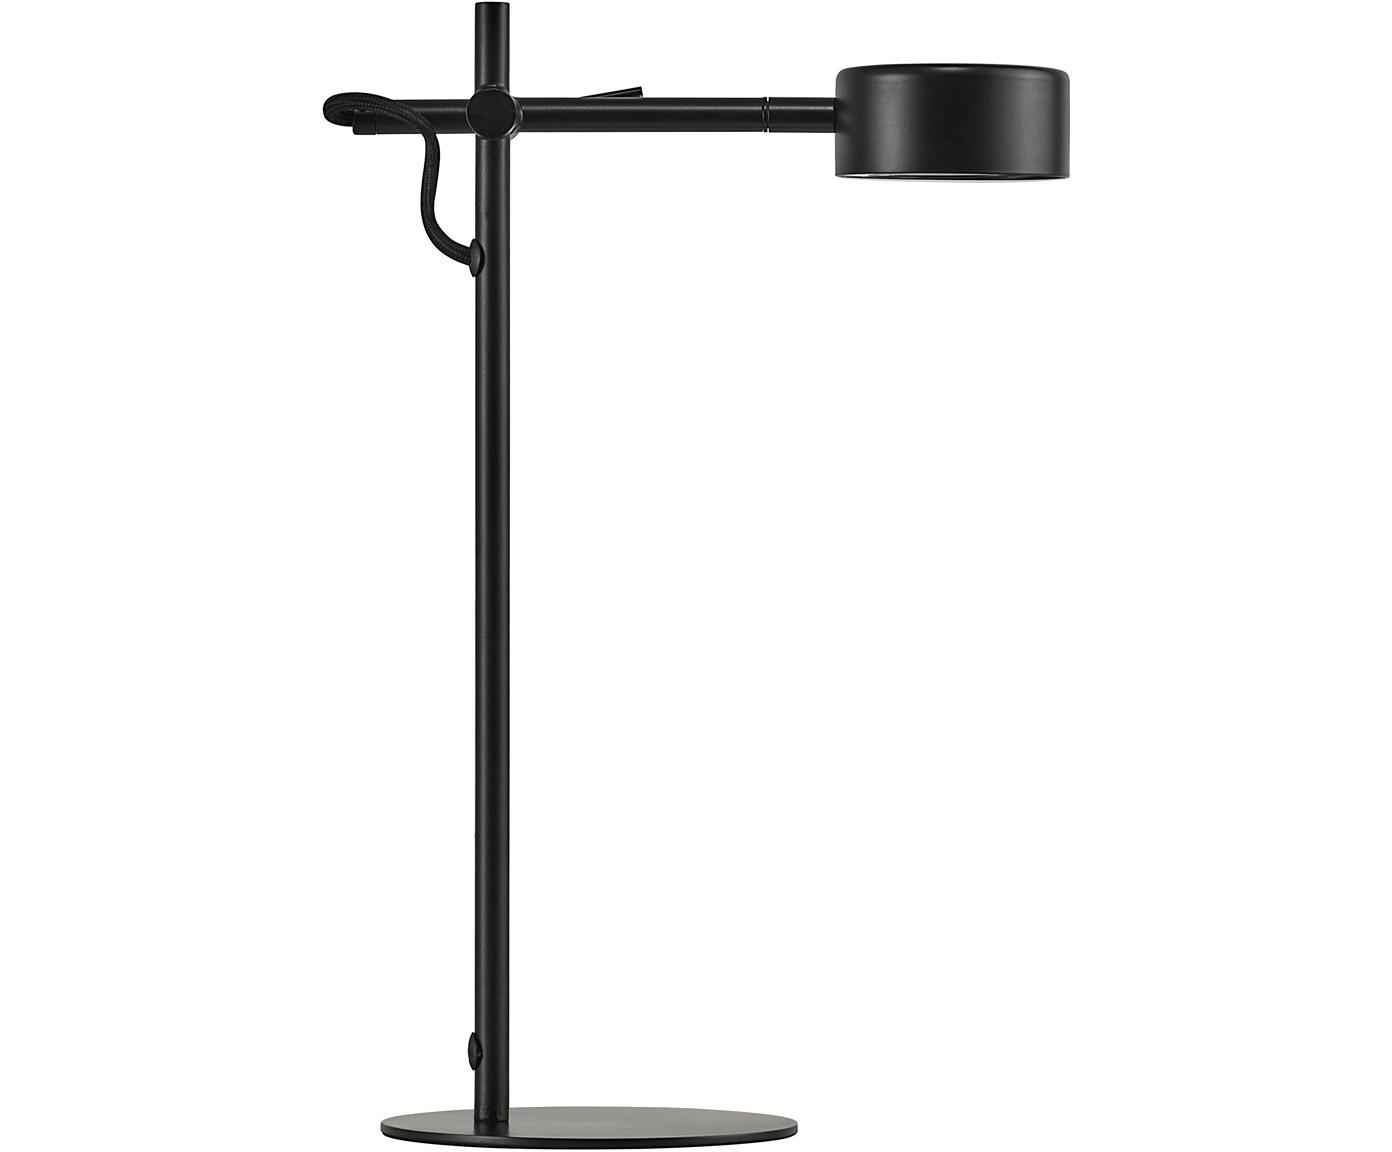 Lampa biurkowa LED Clyde, Czarny, S 15 x W 41 cm